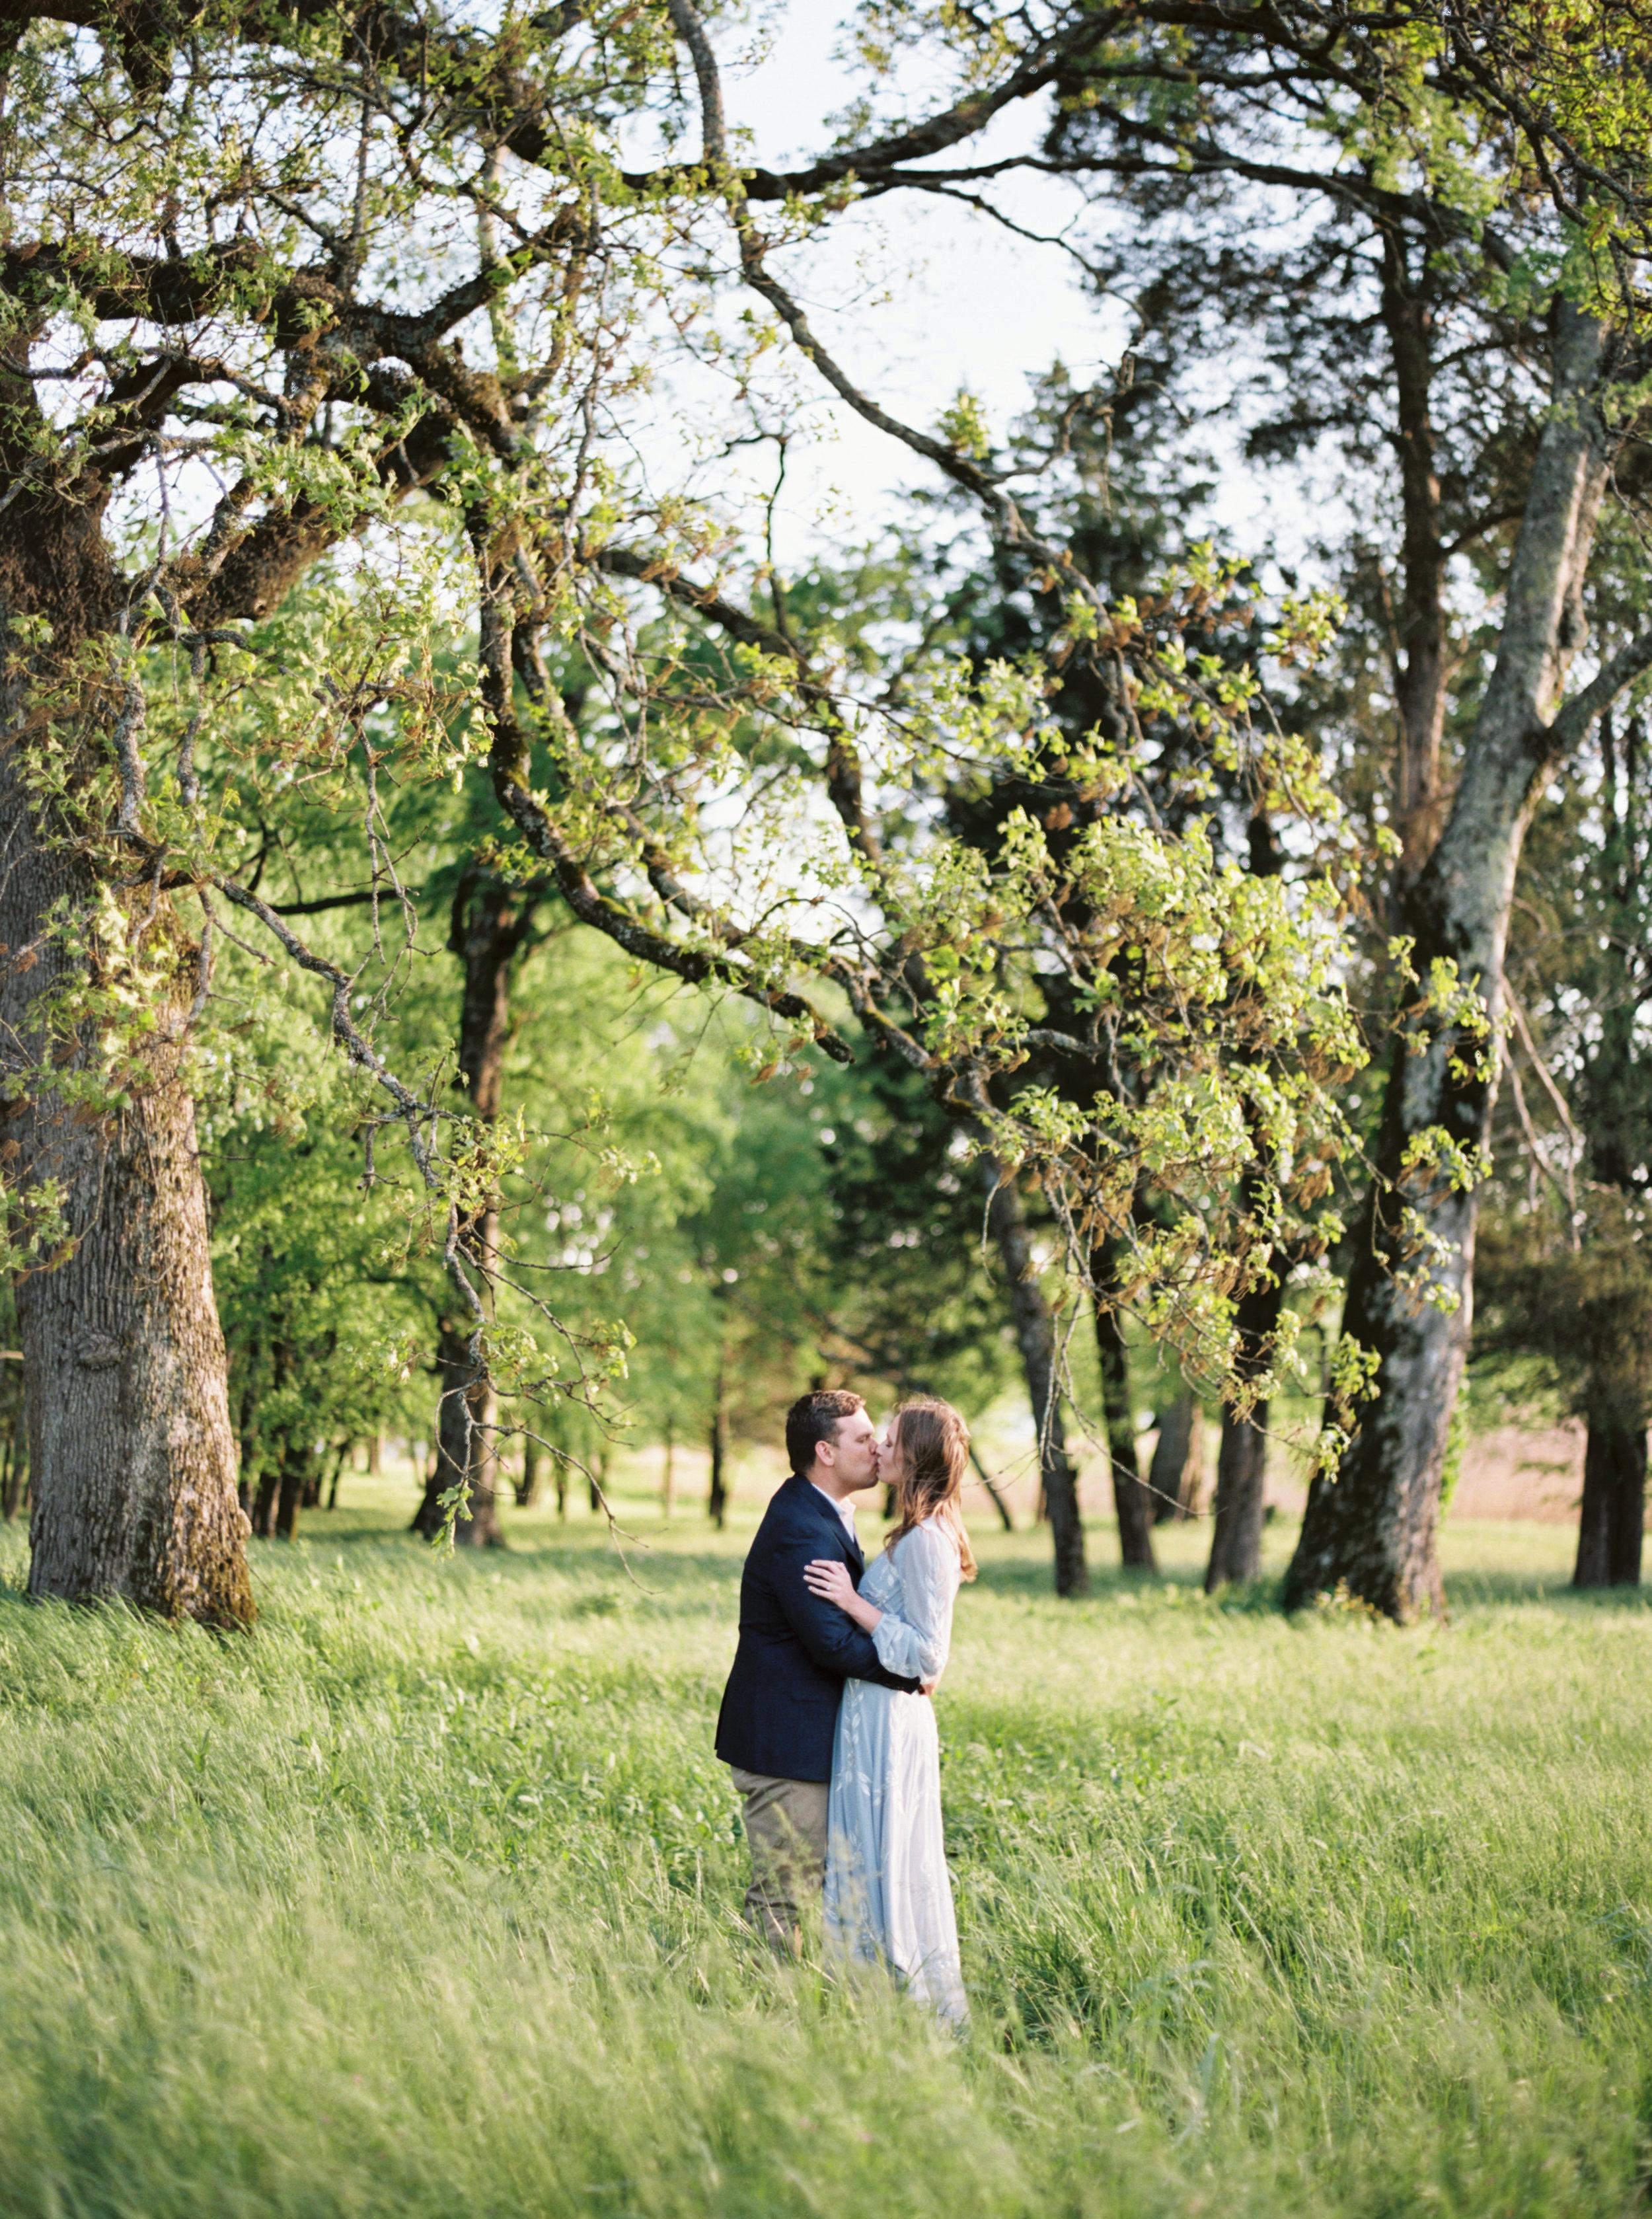 Emma_Ethan_Engagement_Marblegate_Farm_Knozville_Abigail_Malone_Photography-97.jpg